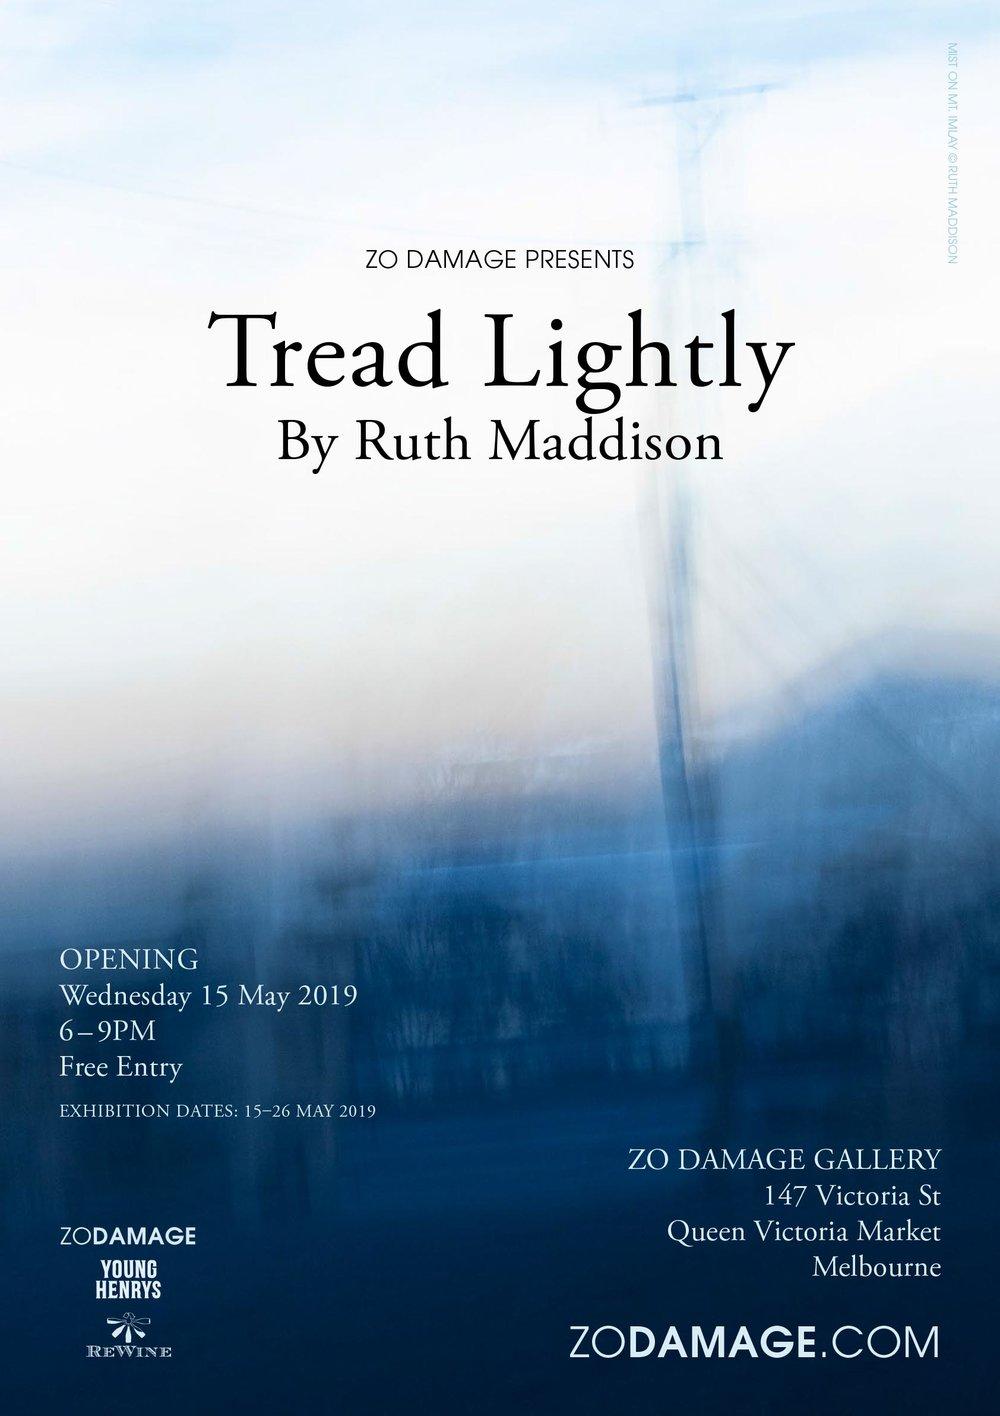 Tread Lighty by Ruth Maddison II.jpg